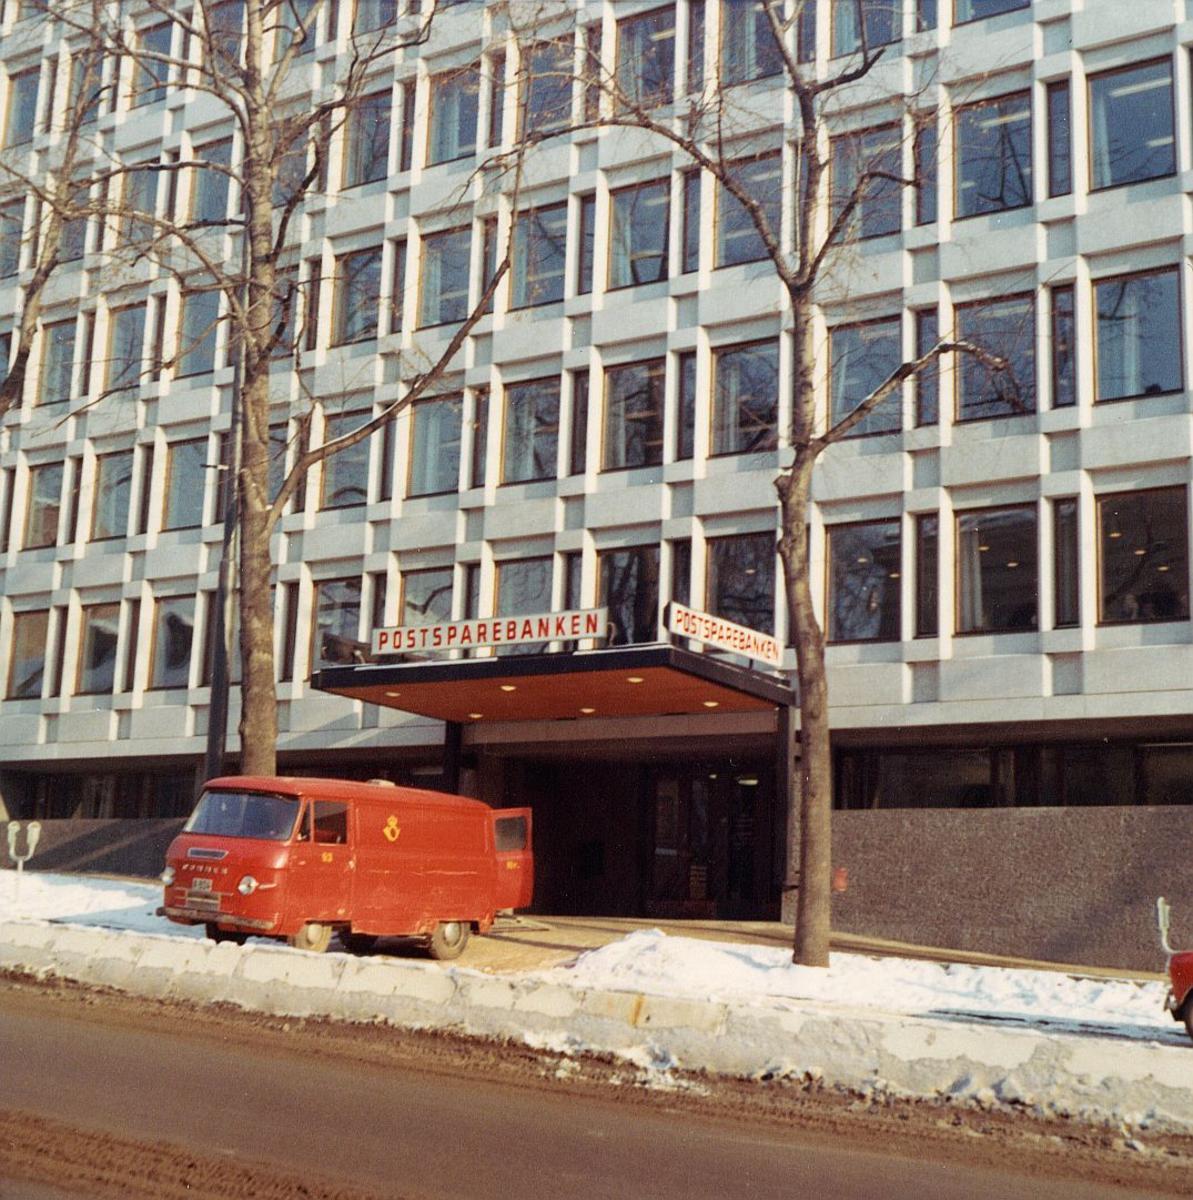 postsparebanken, Akersgata 68, Oslo, snø, rød bil, logo, eksteriør